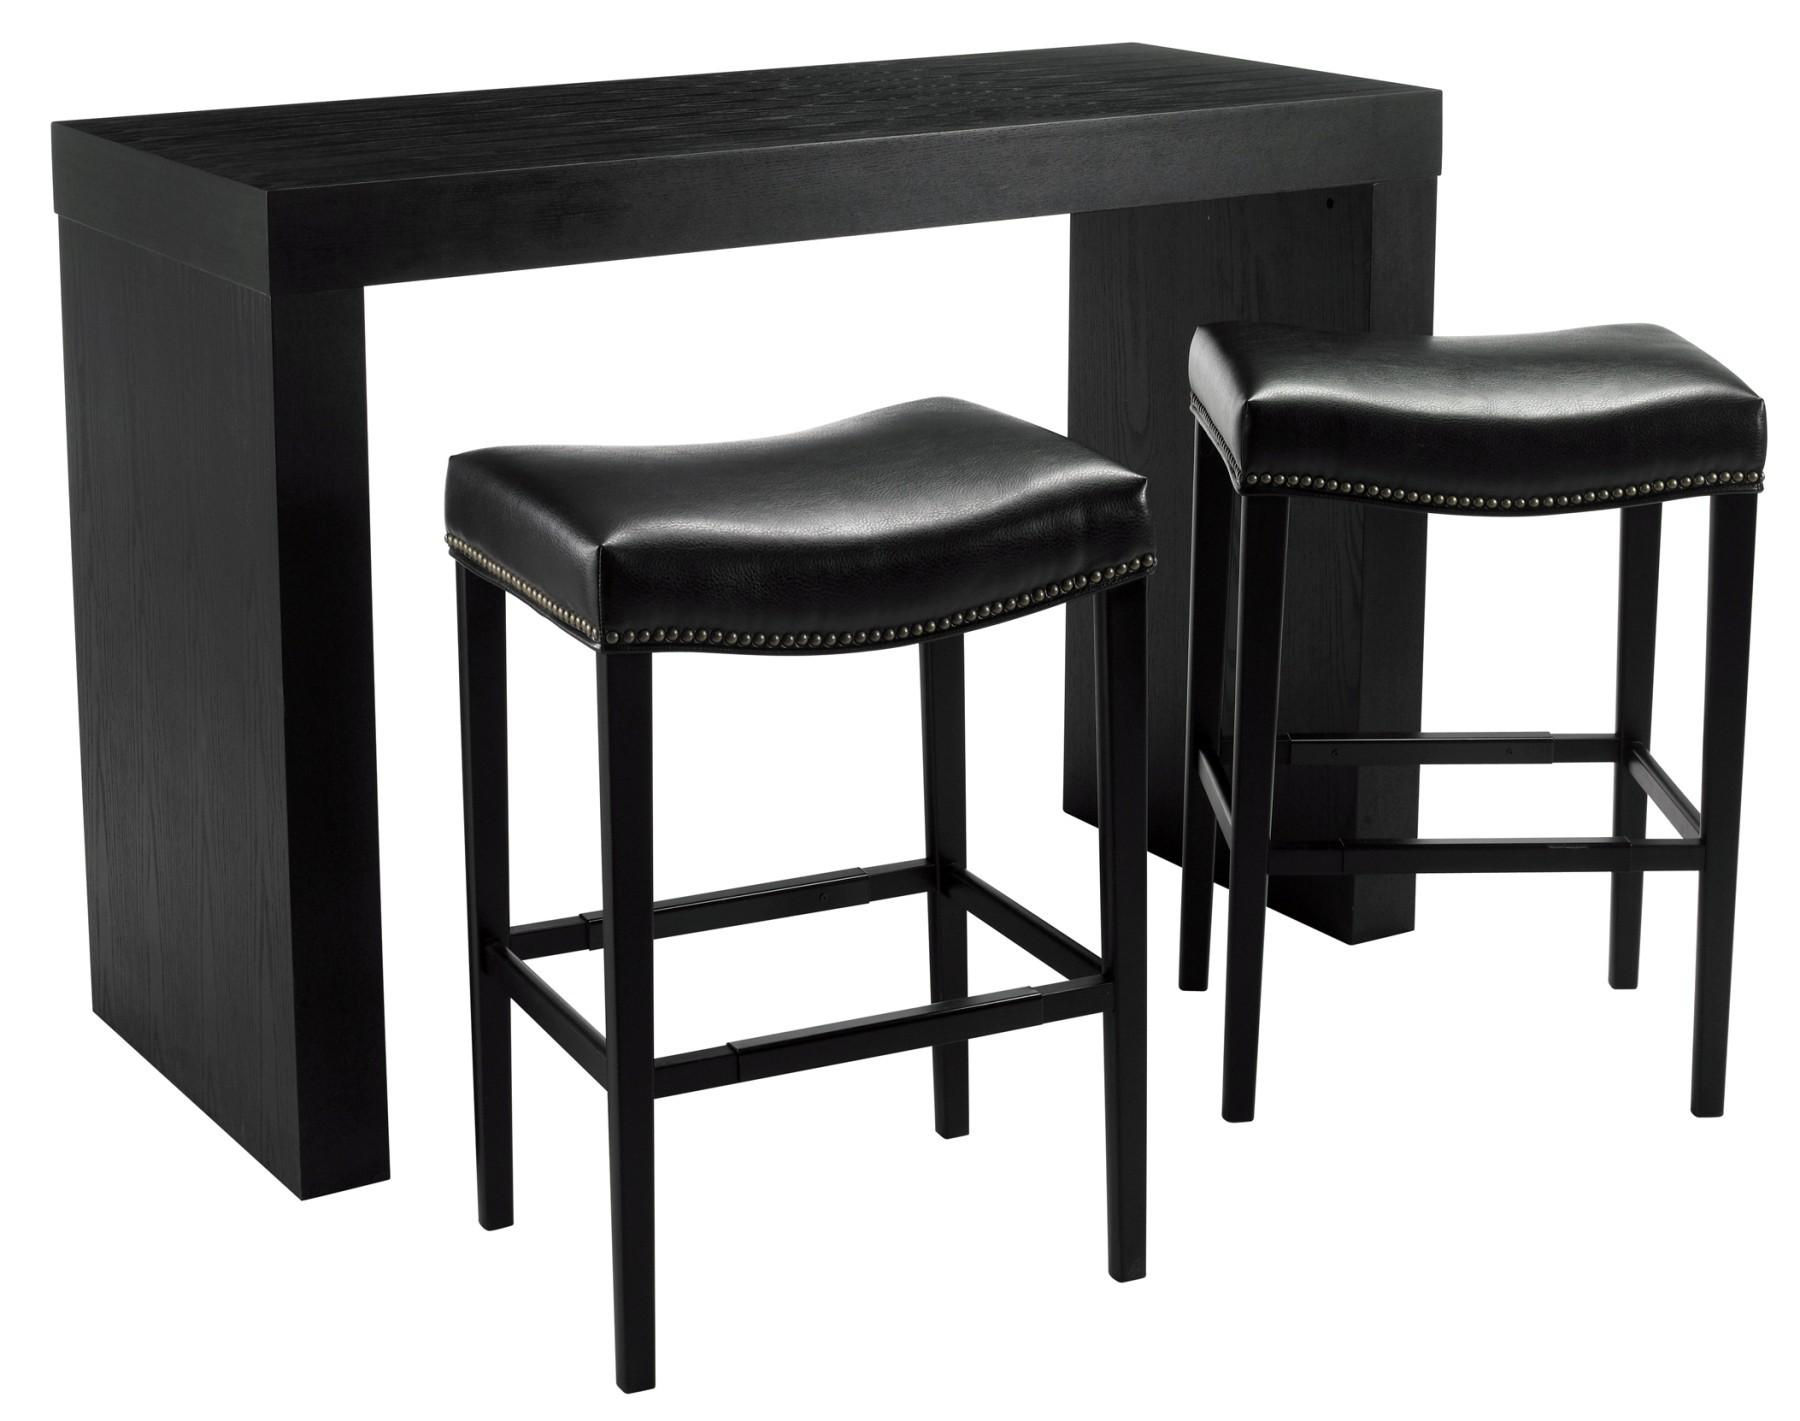 Faro C Shape Counter Table From Sunpan 40258 Coleman